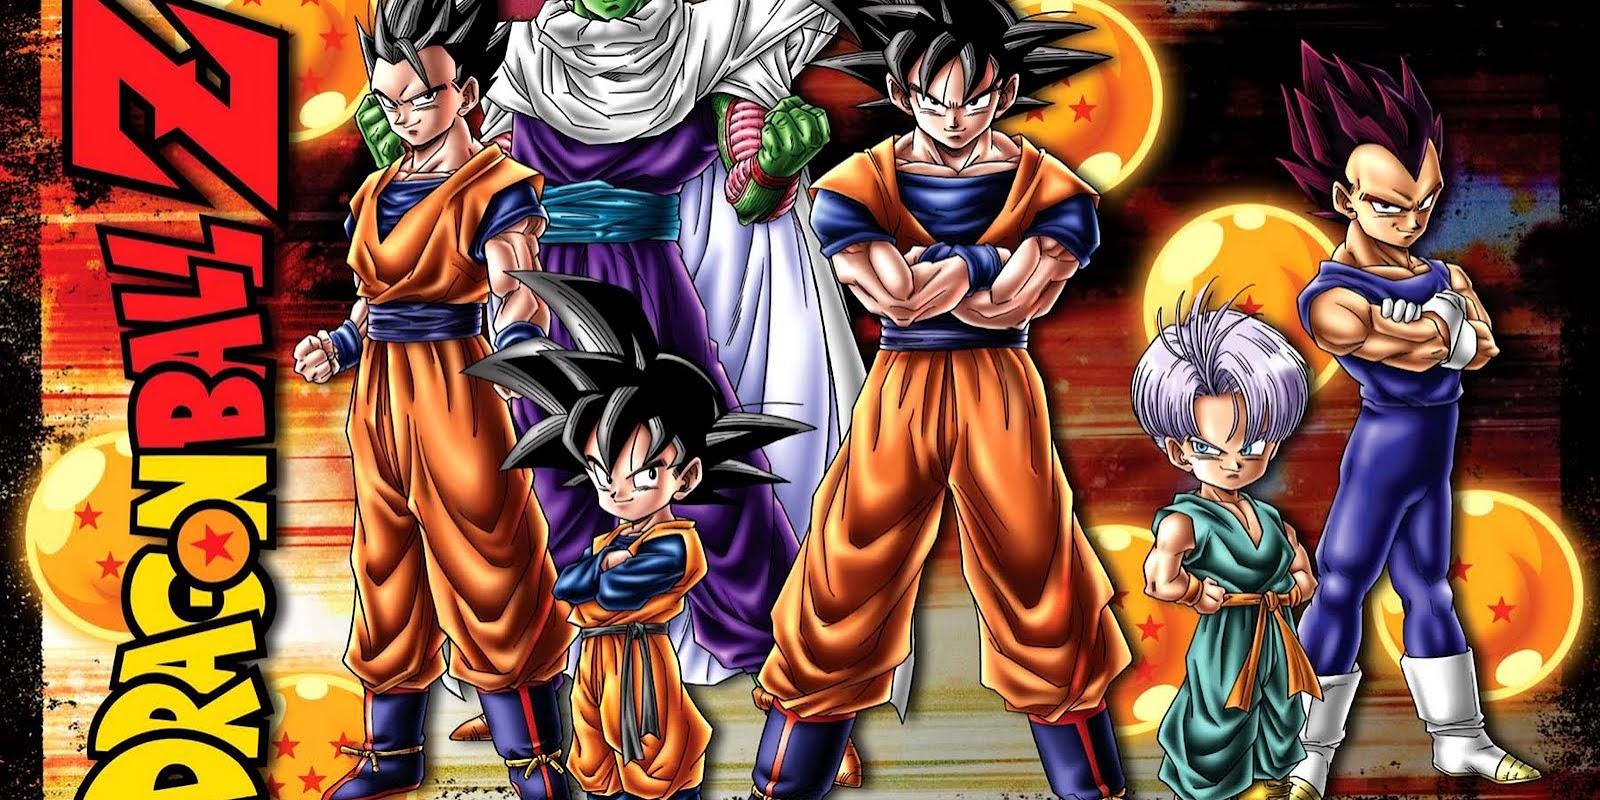 Cheats Dragon Ball Z:Budokai Tenkaichi 3